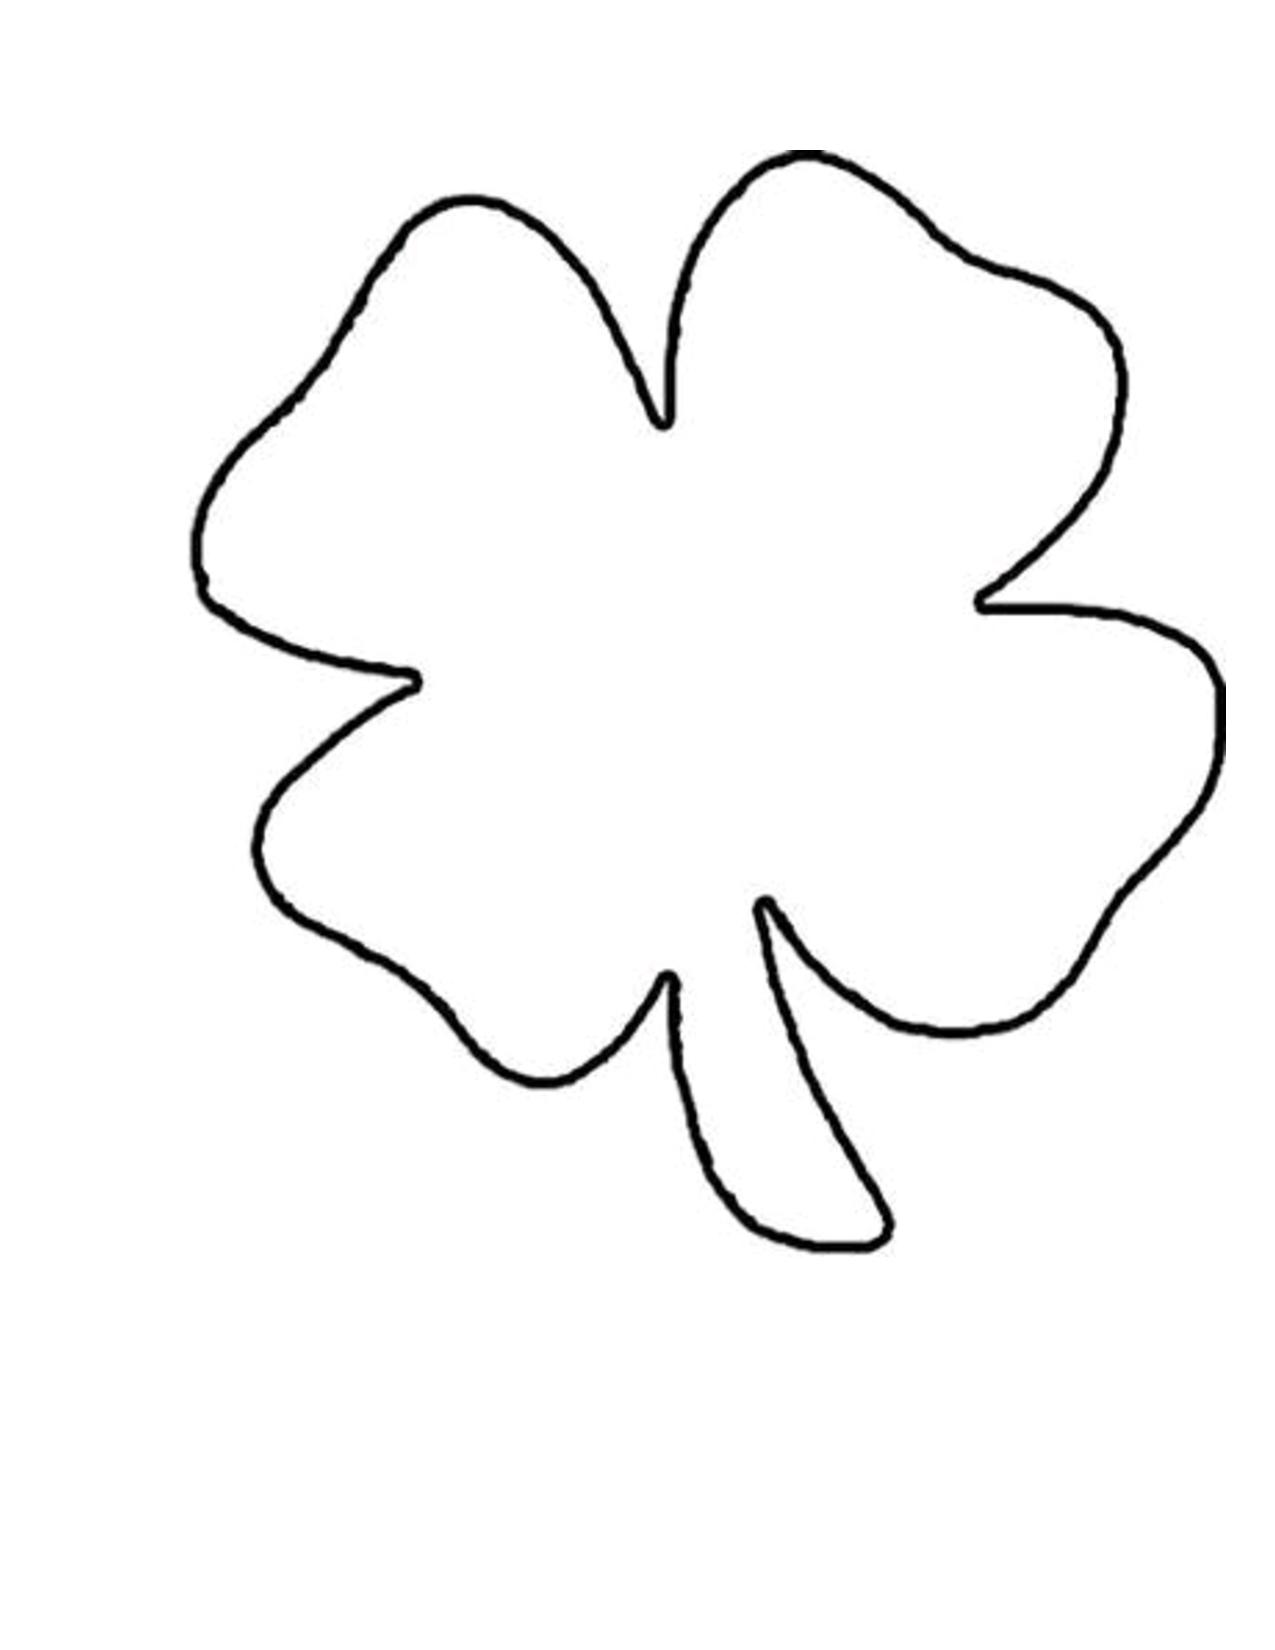 Four Leaf Clover Template Printable Free   Free Printable